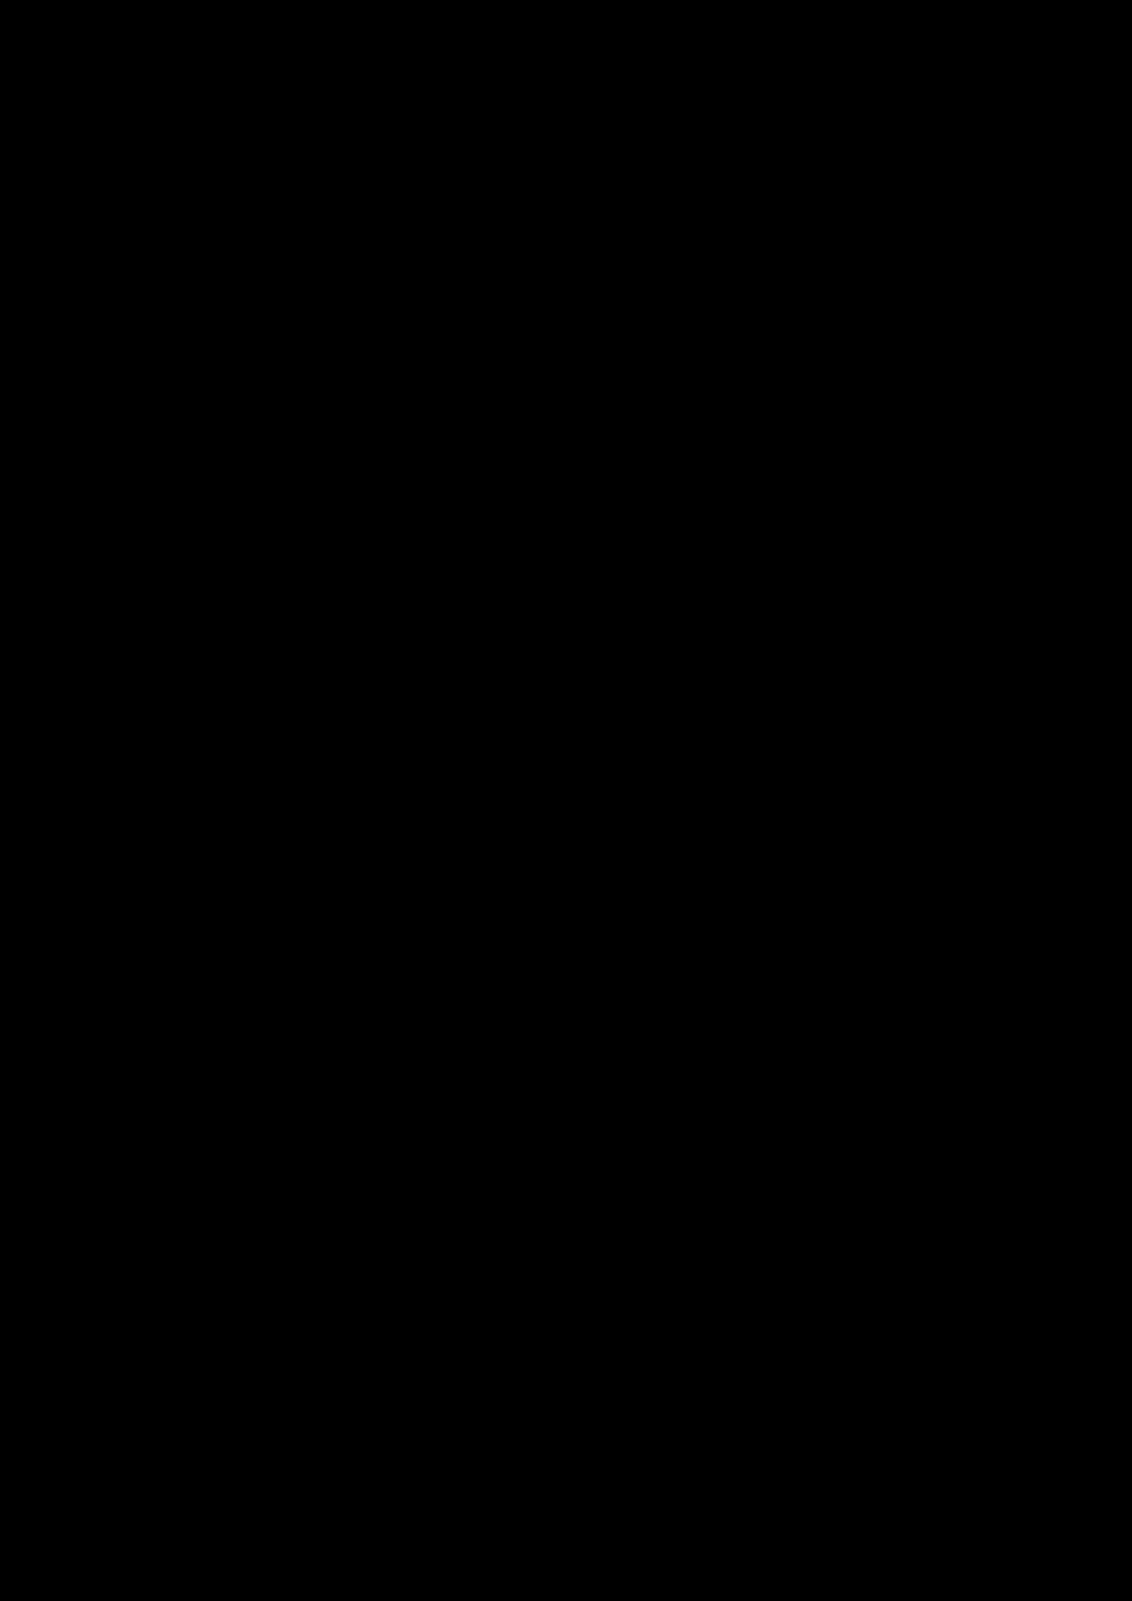 Okean Pustotyi slide, Image 49